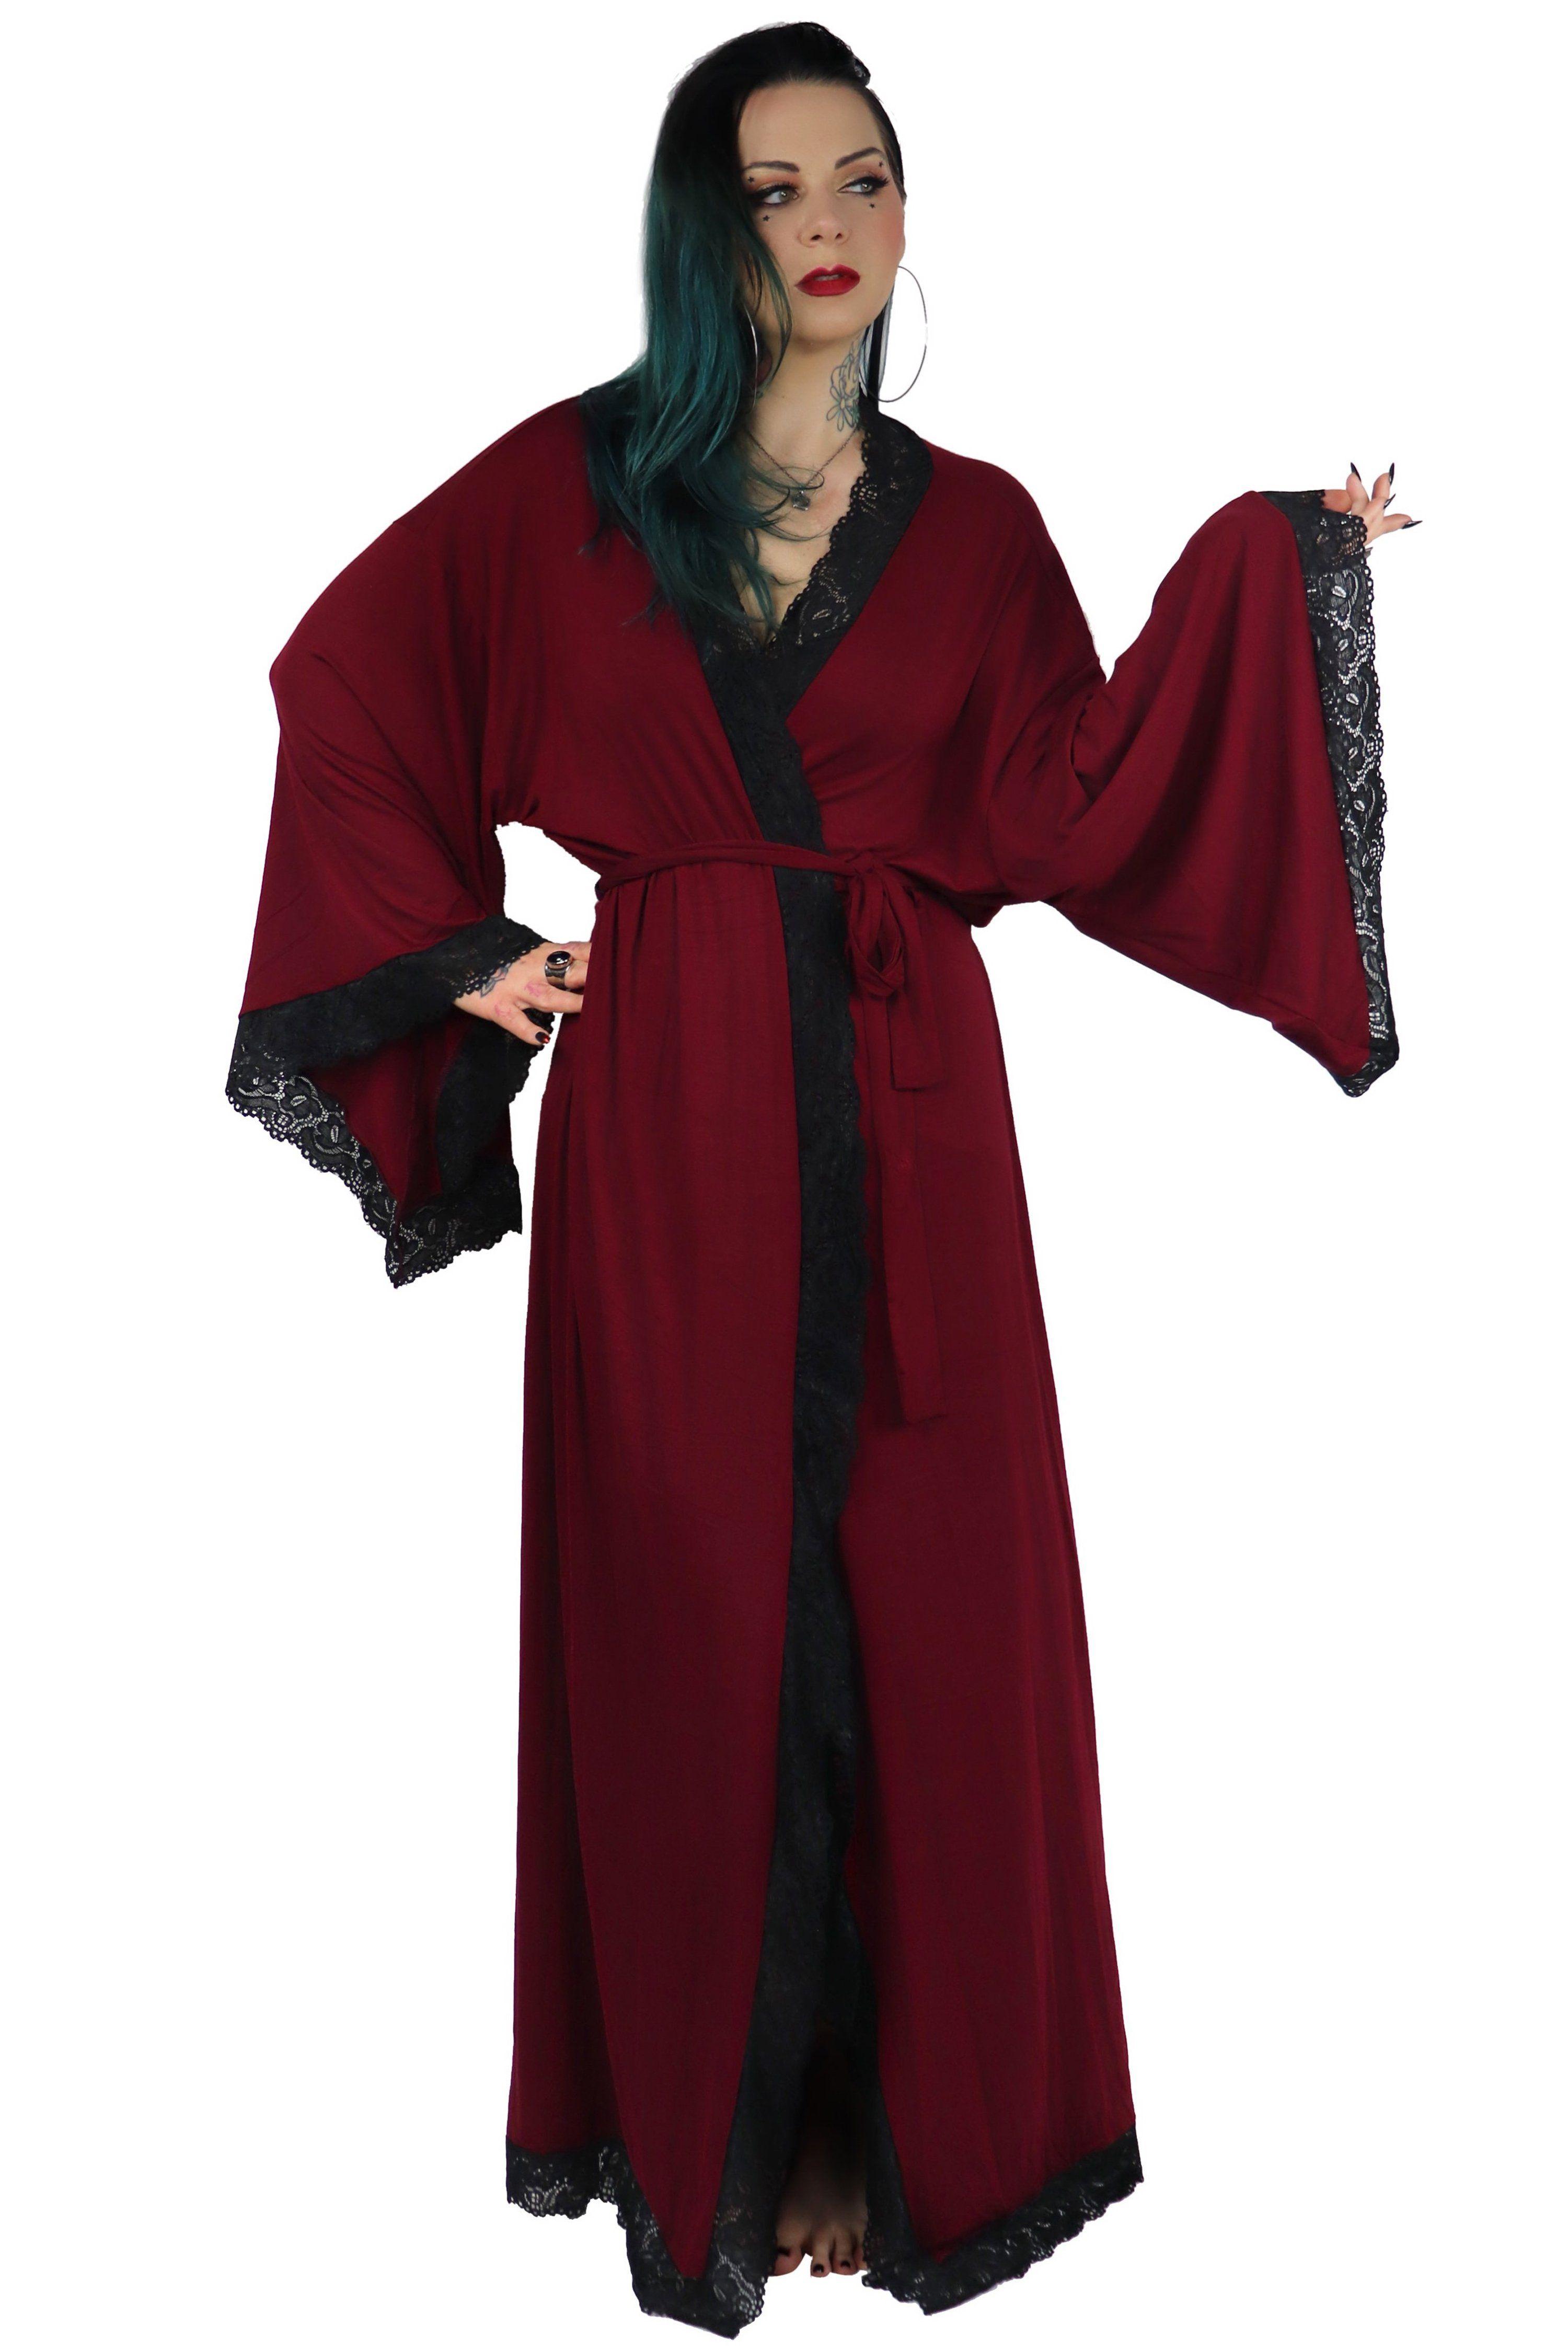 Bathory Dressing Robe Red Wine Limited Edition Foxblood Shop Fashion Stretch Cotton Robe